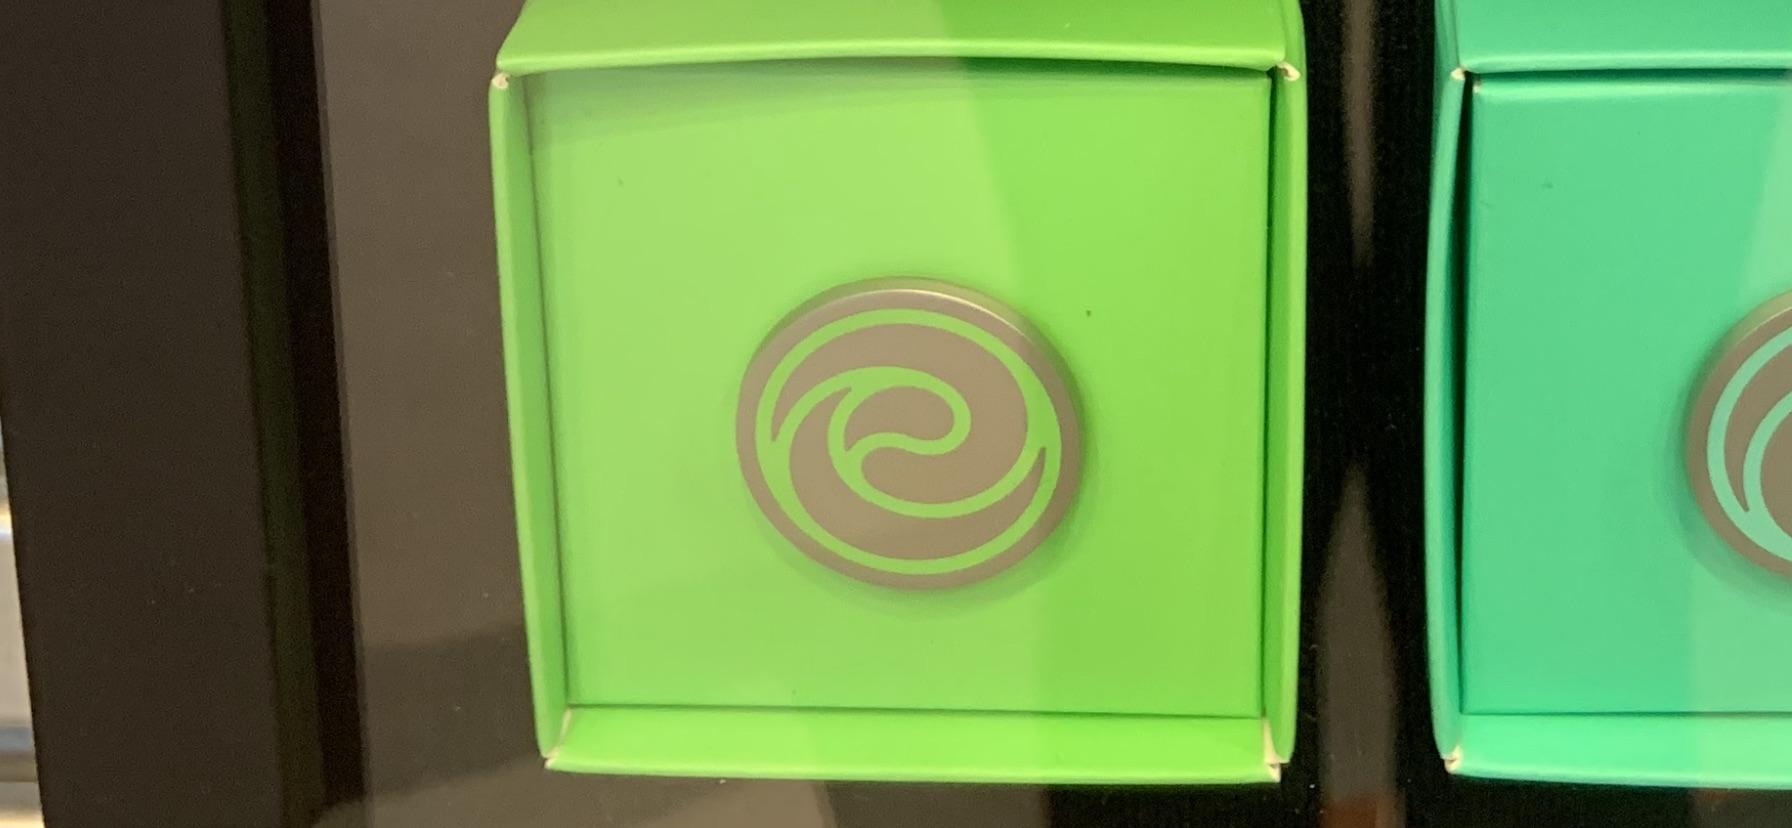 EPCOT pavilion logo pins 12/23/19 18